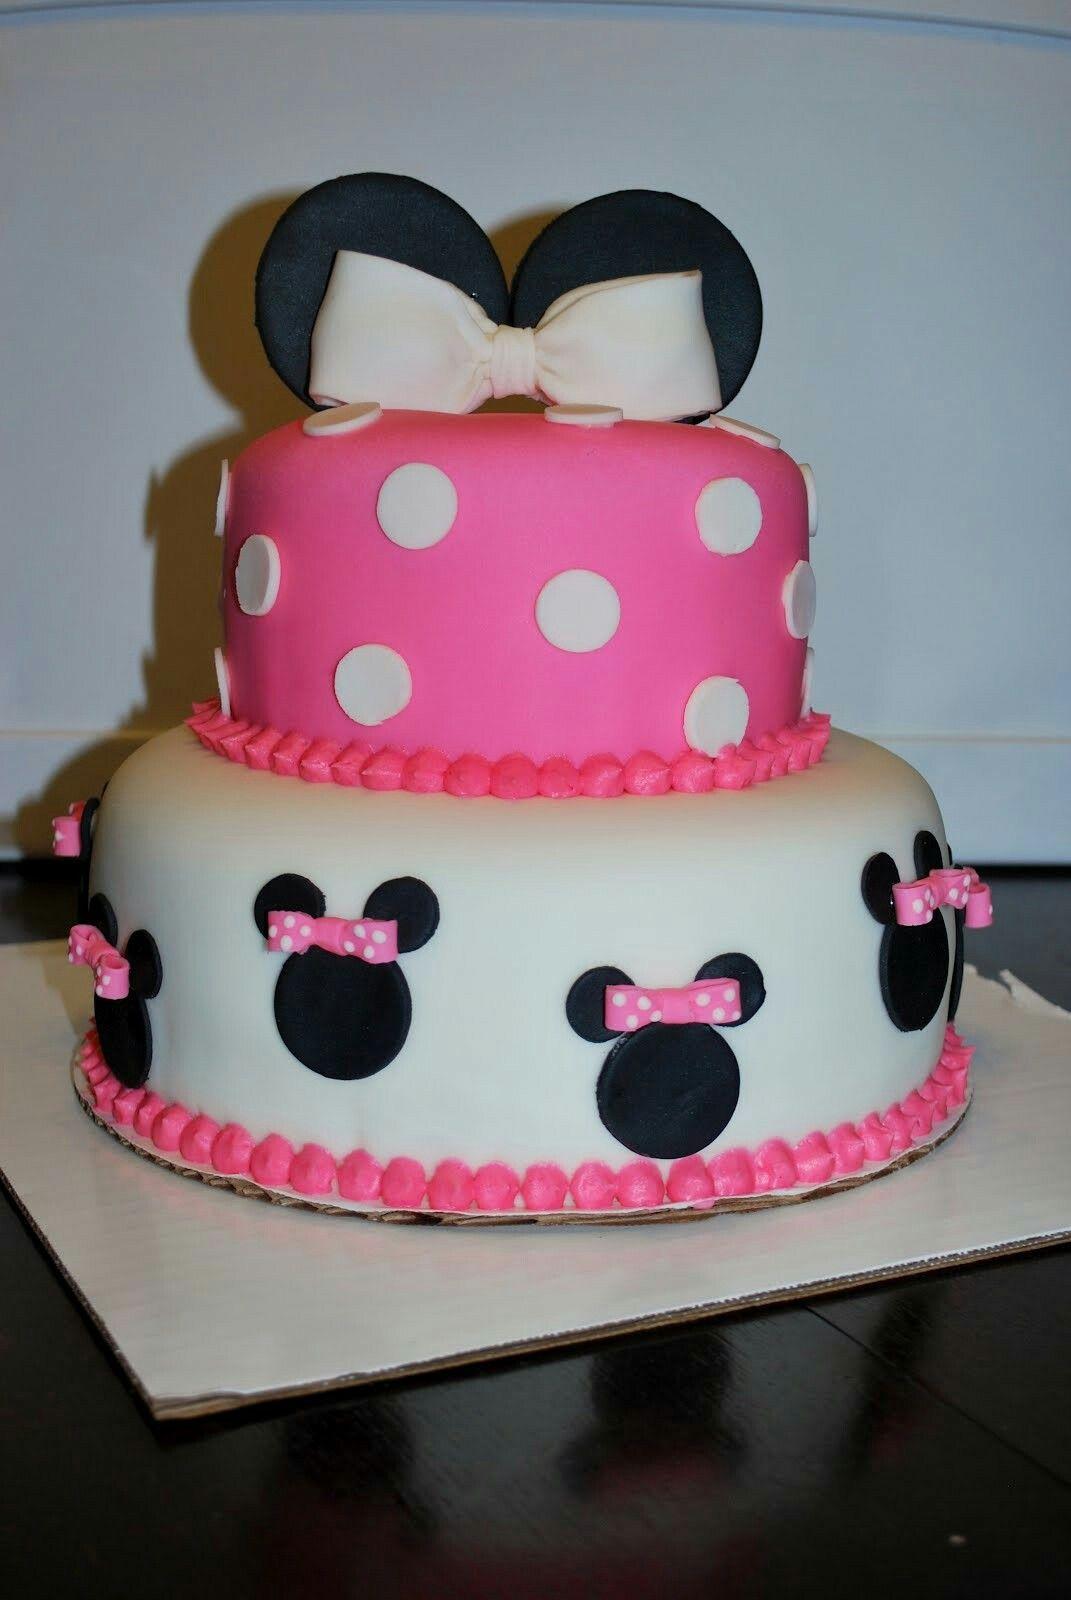 Pin By Stephanie Simonds On Girl Birthday Cakes Pinterest Girl